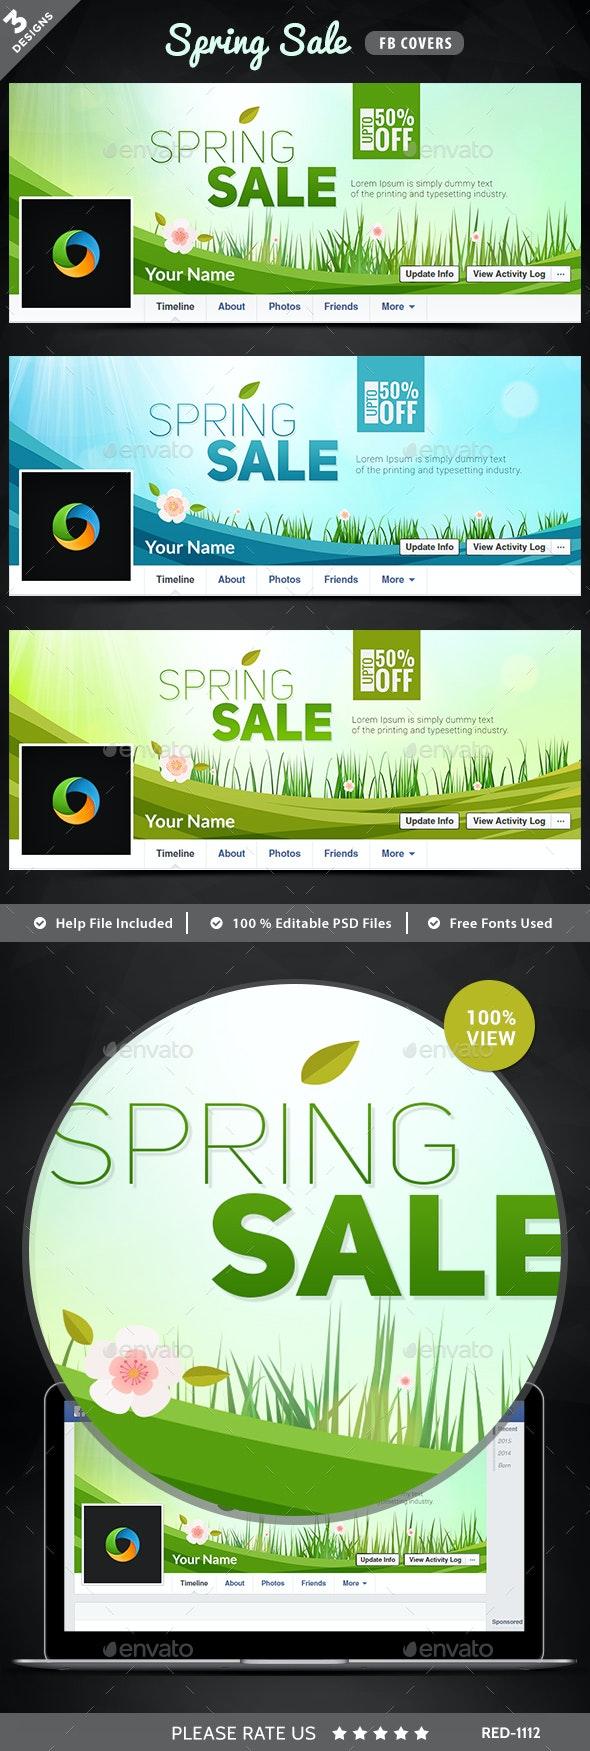 Spring Sale Facebook Covers - 3 Designs - Facebook Timeline Covers Social Media